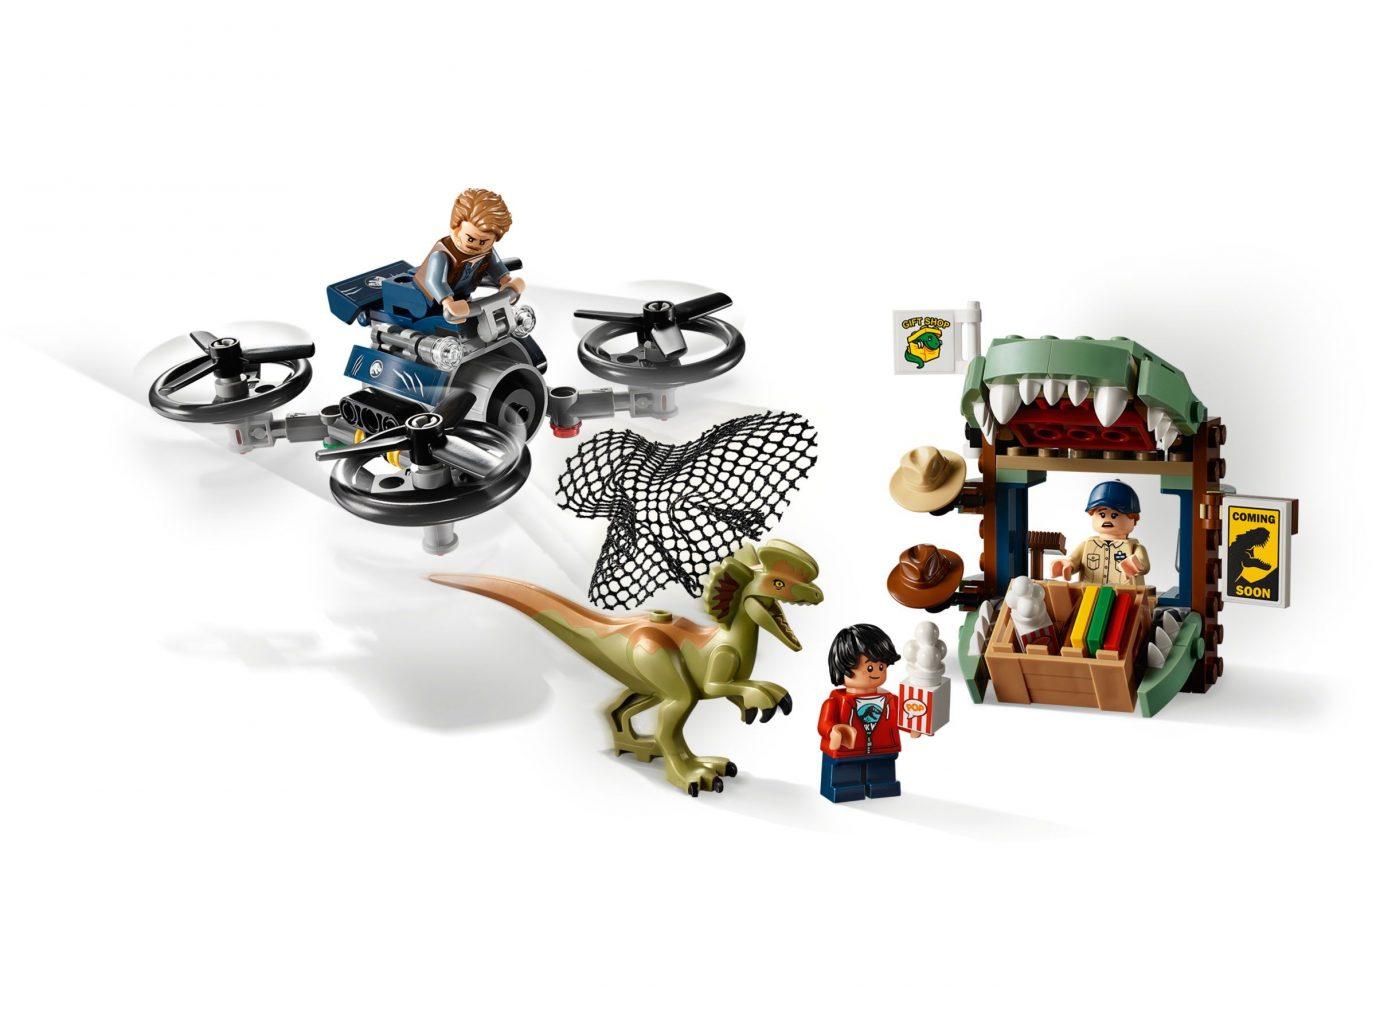 LEGO JURASSIC WORLD  `` DILOPHOSAURUS ON THE LOOSE ´´  Ref 75934  NUEVO